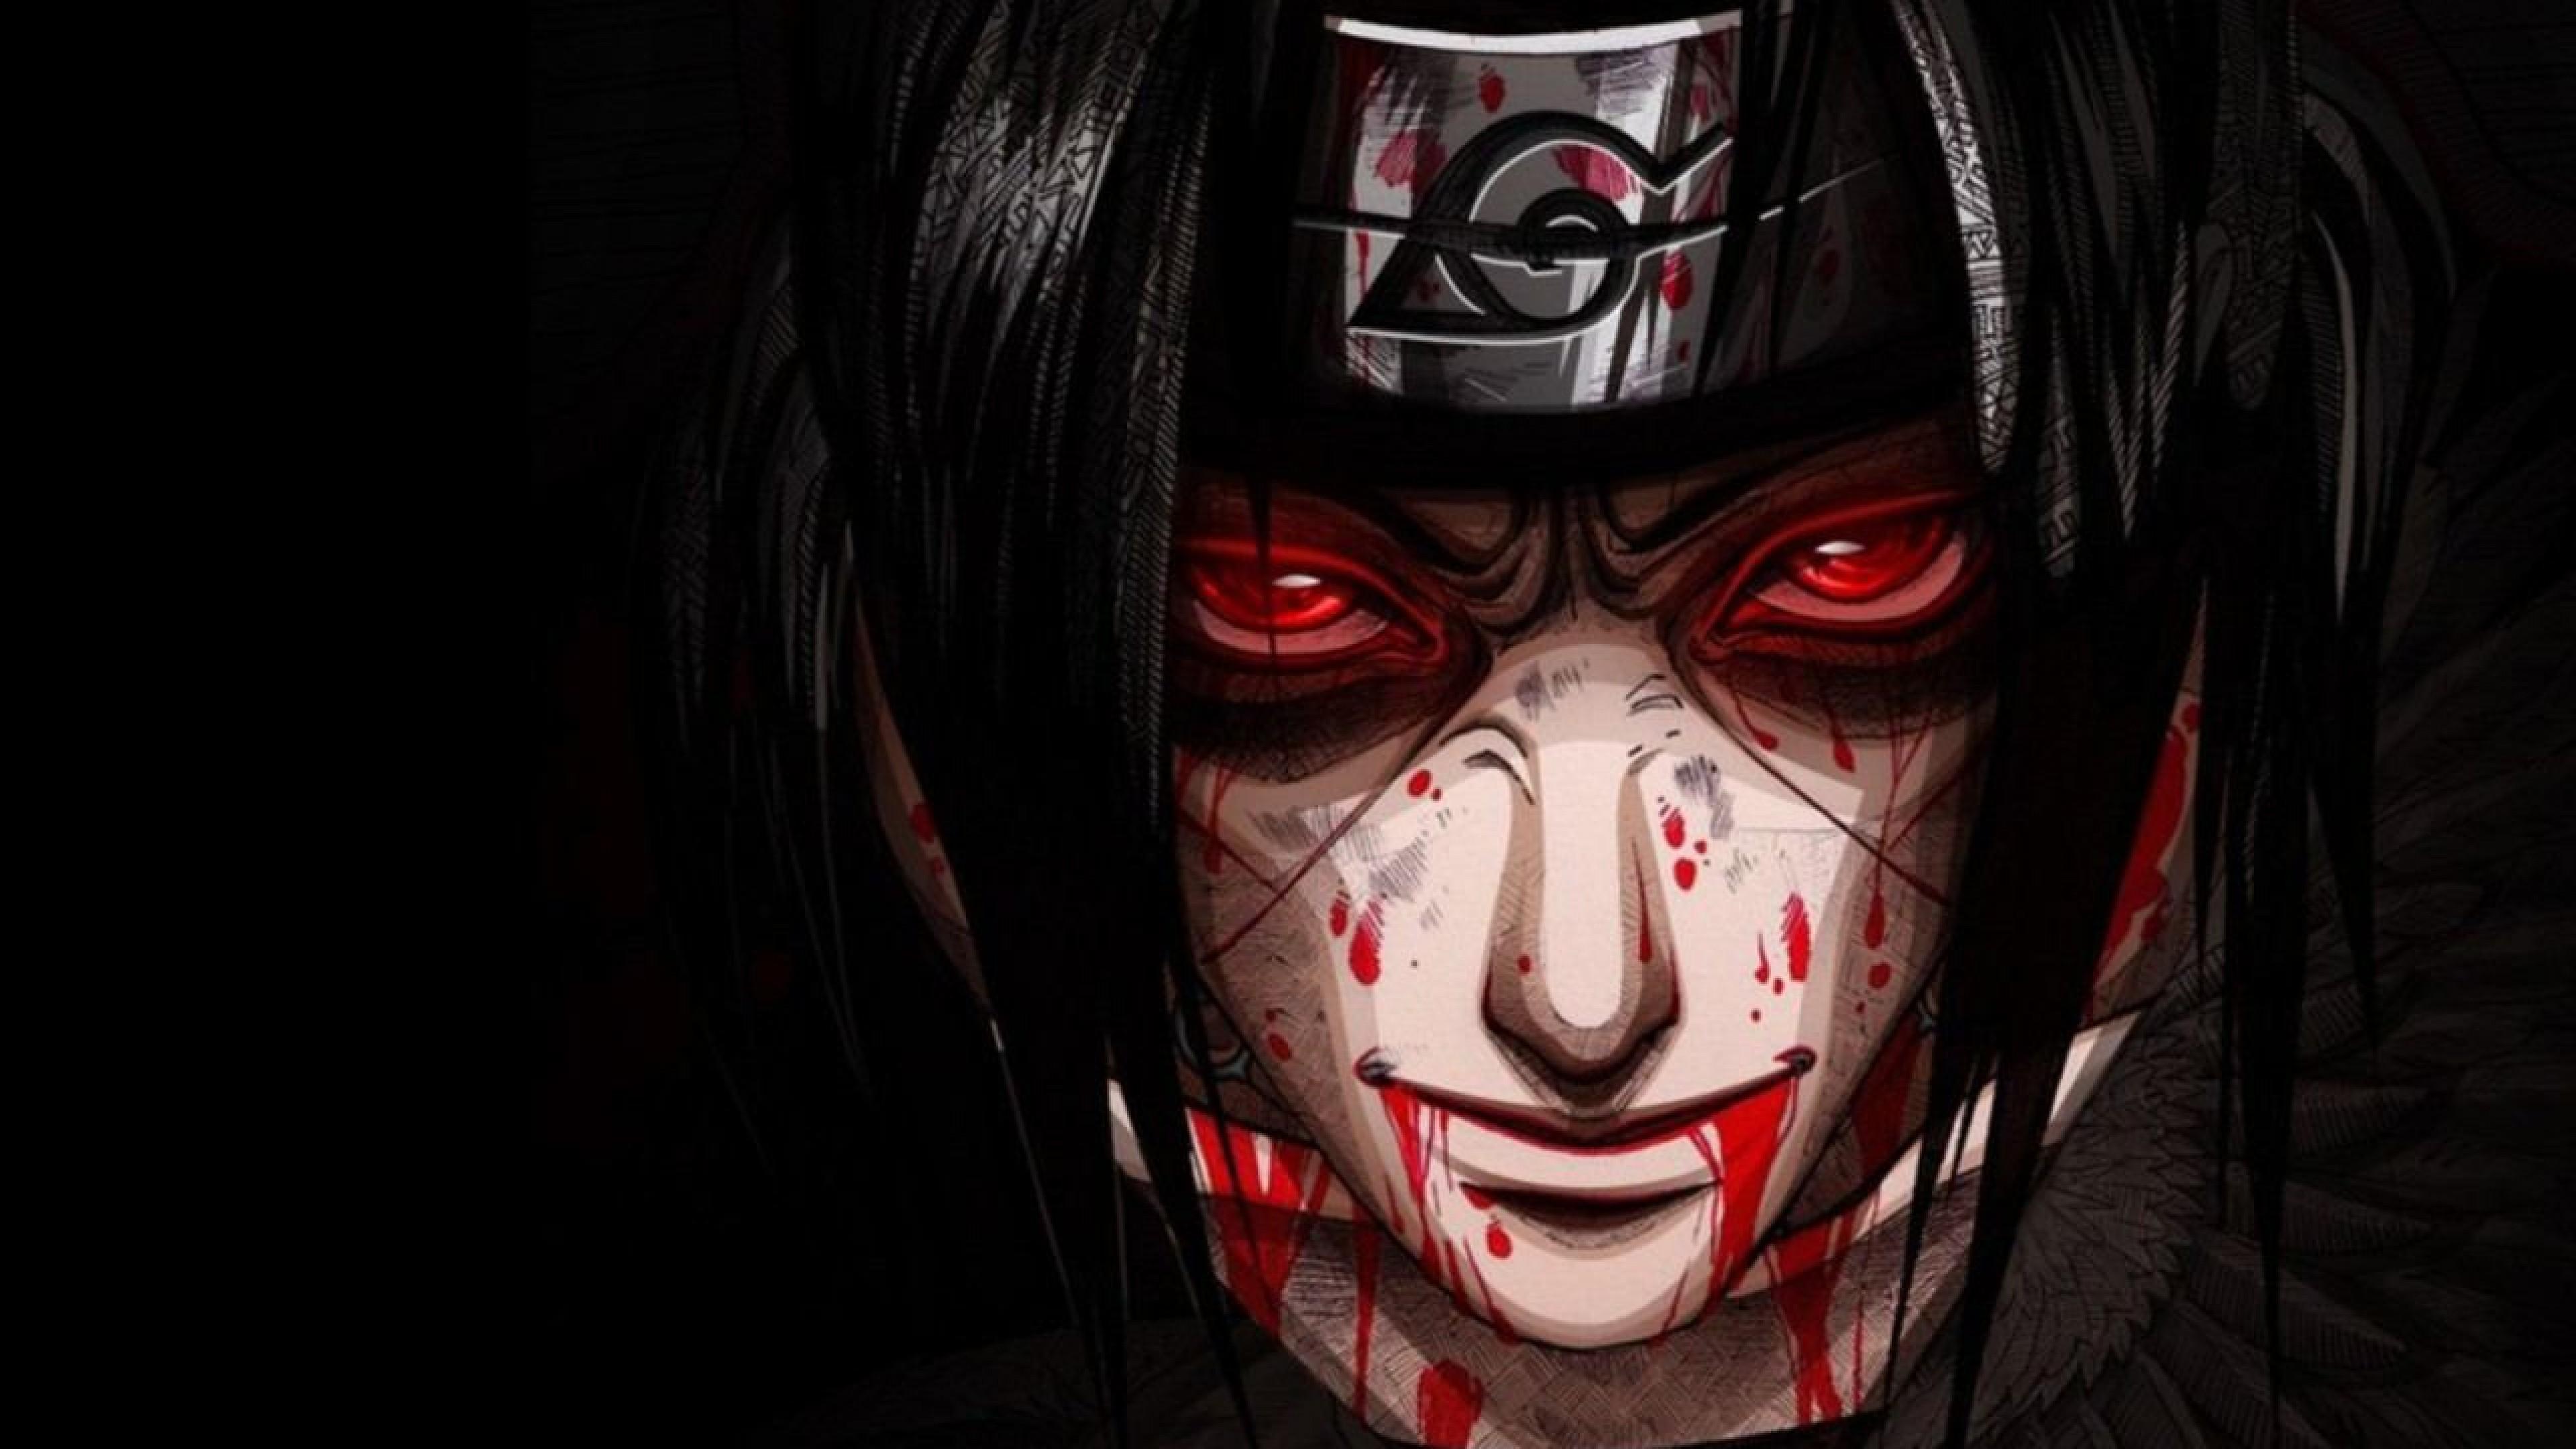 Sai Naruto Wallpaper For Desktop And Mobiles 4k Ultra Hd